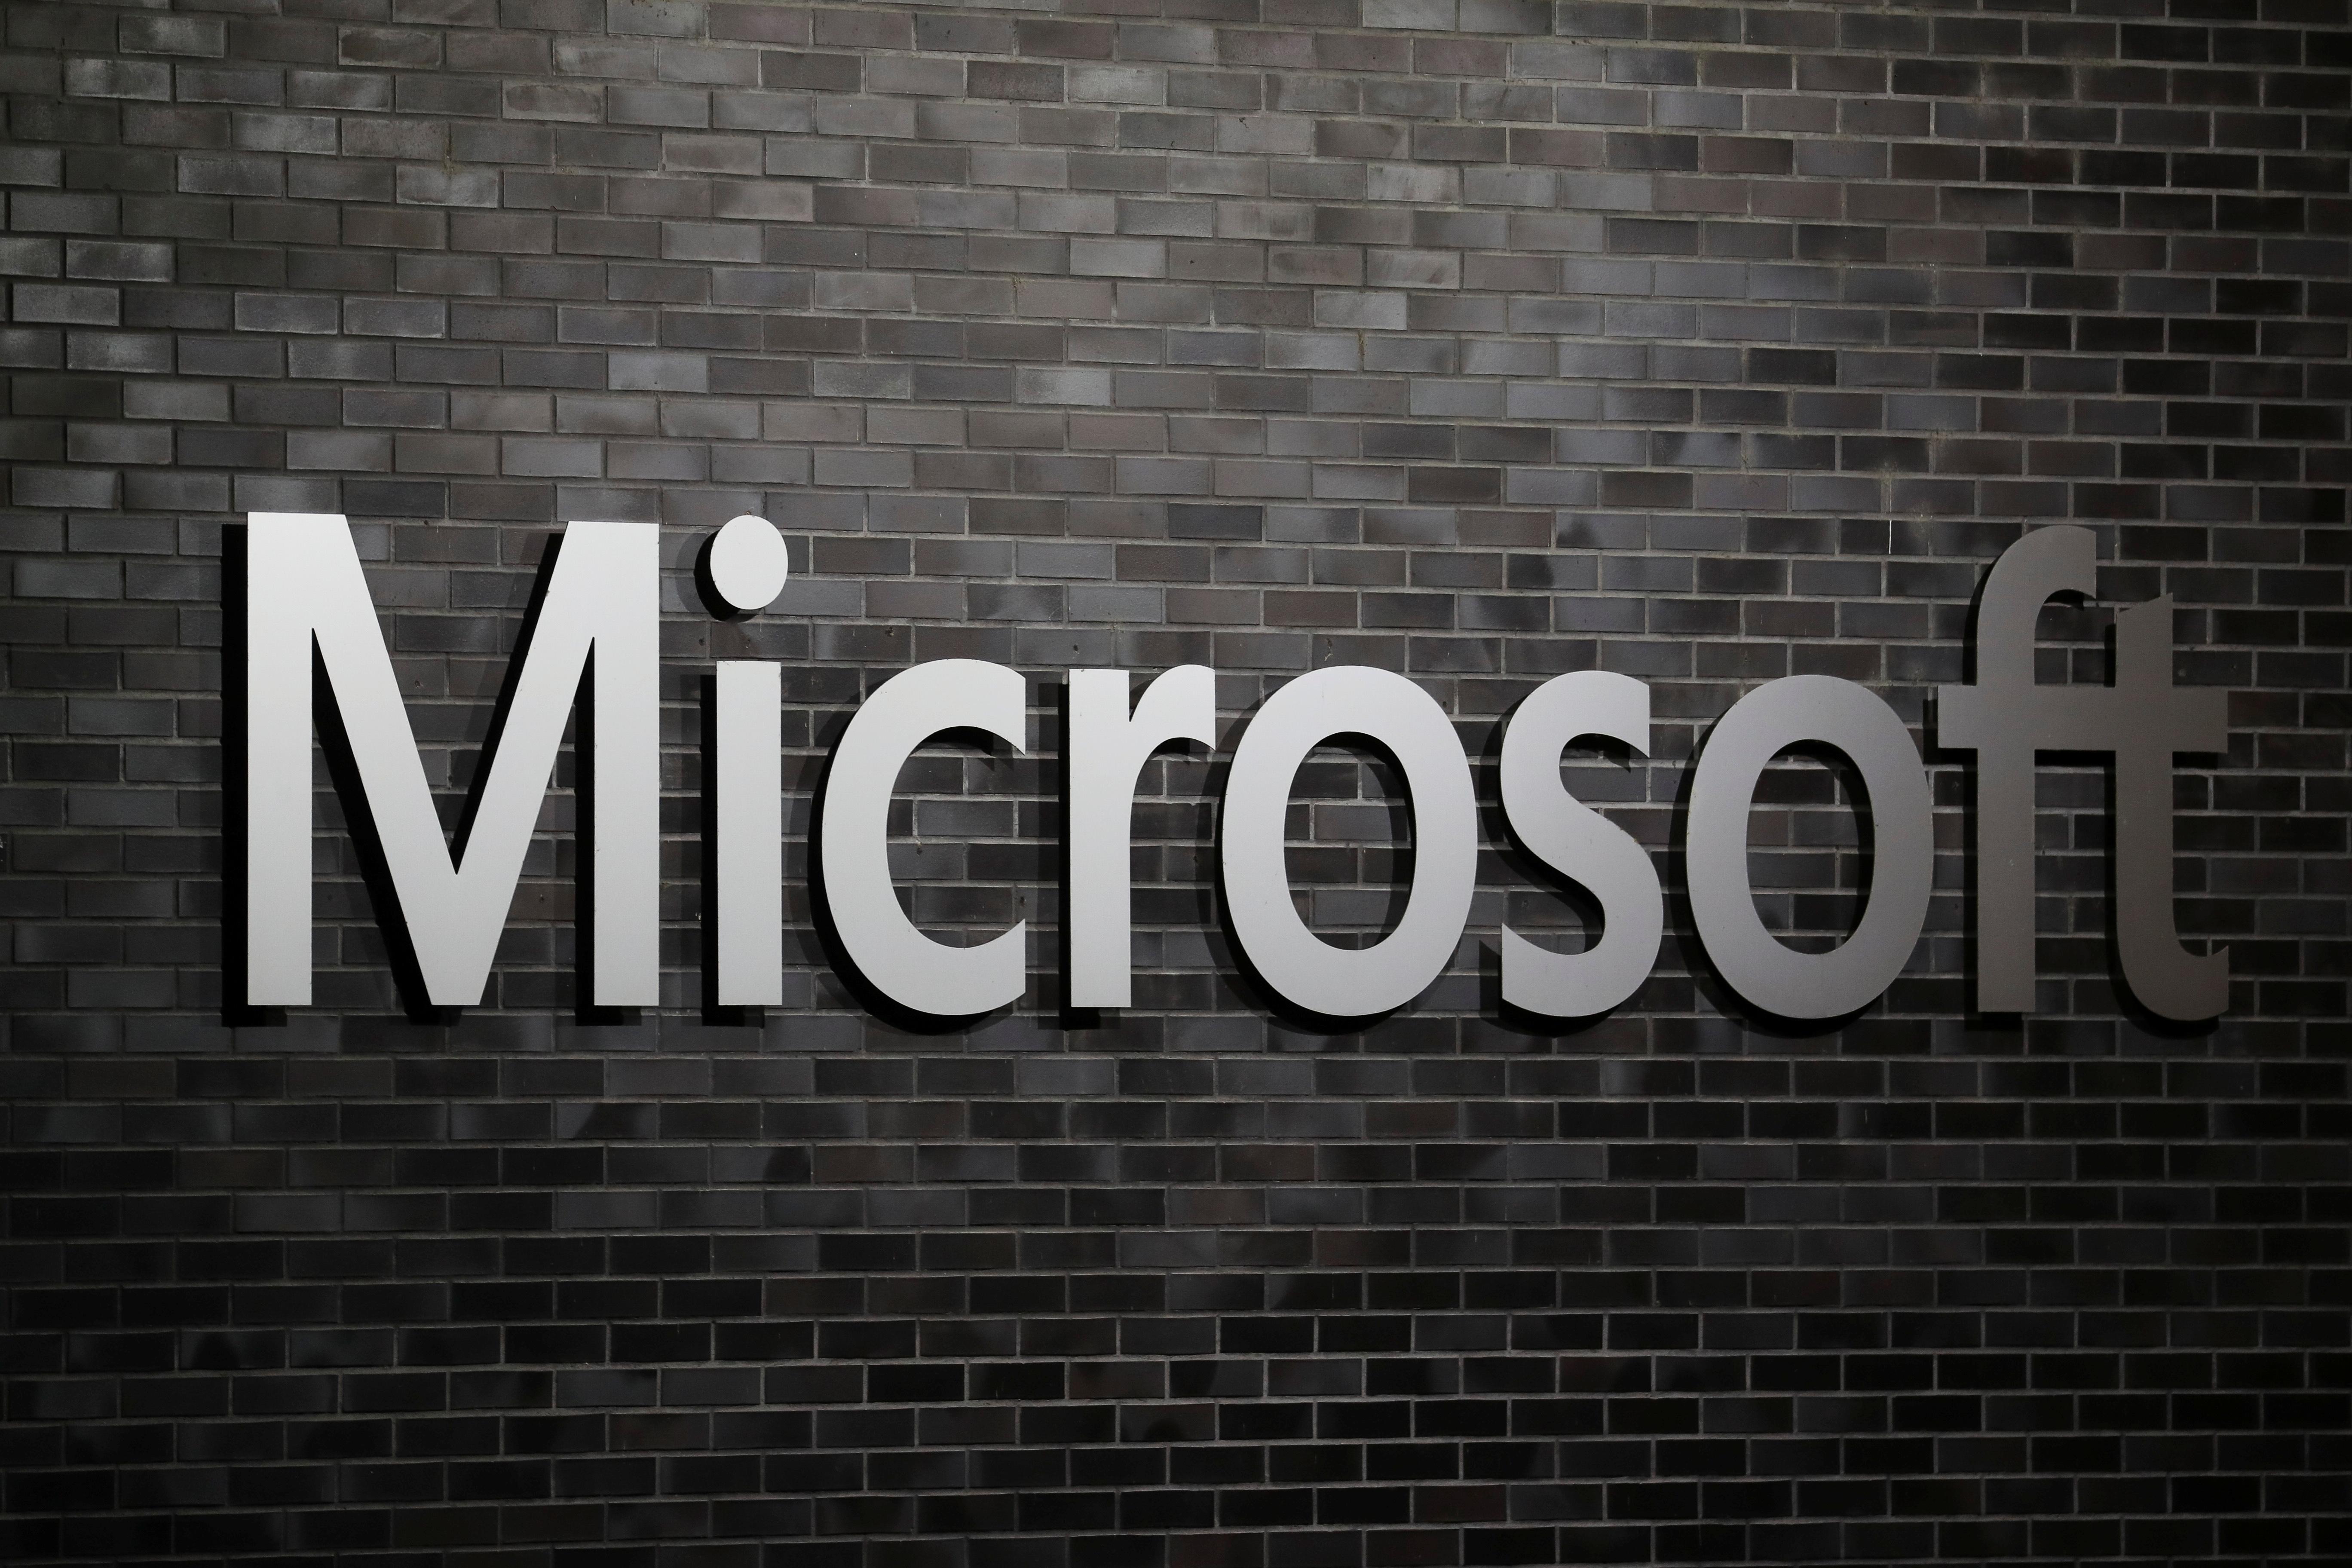 The logo of Microsoft is seen at an office building in Wallisellen, Switzerland December 21, 2020.  REUTERS/Arnd Wiegmann